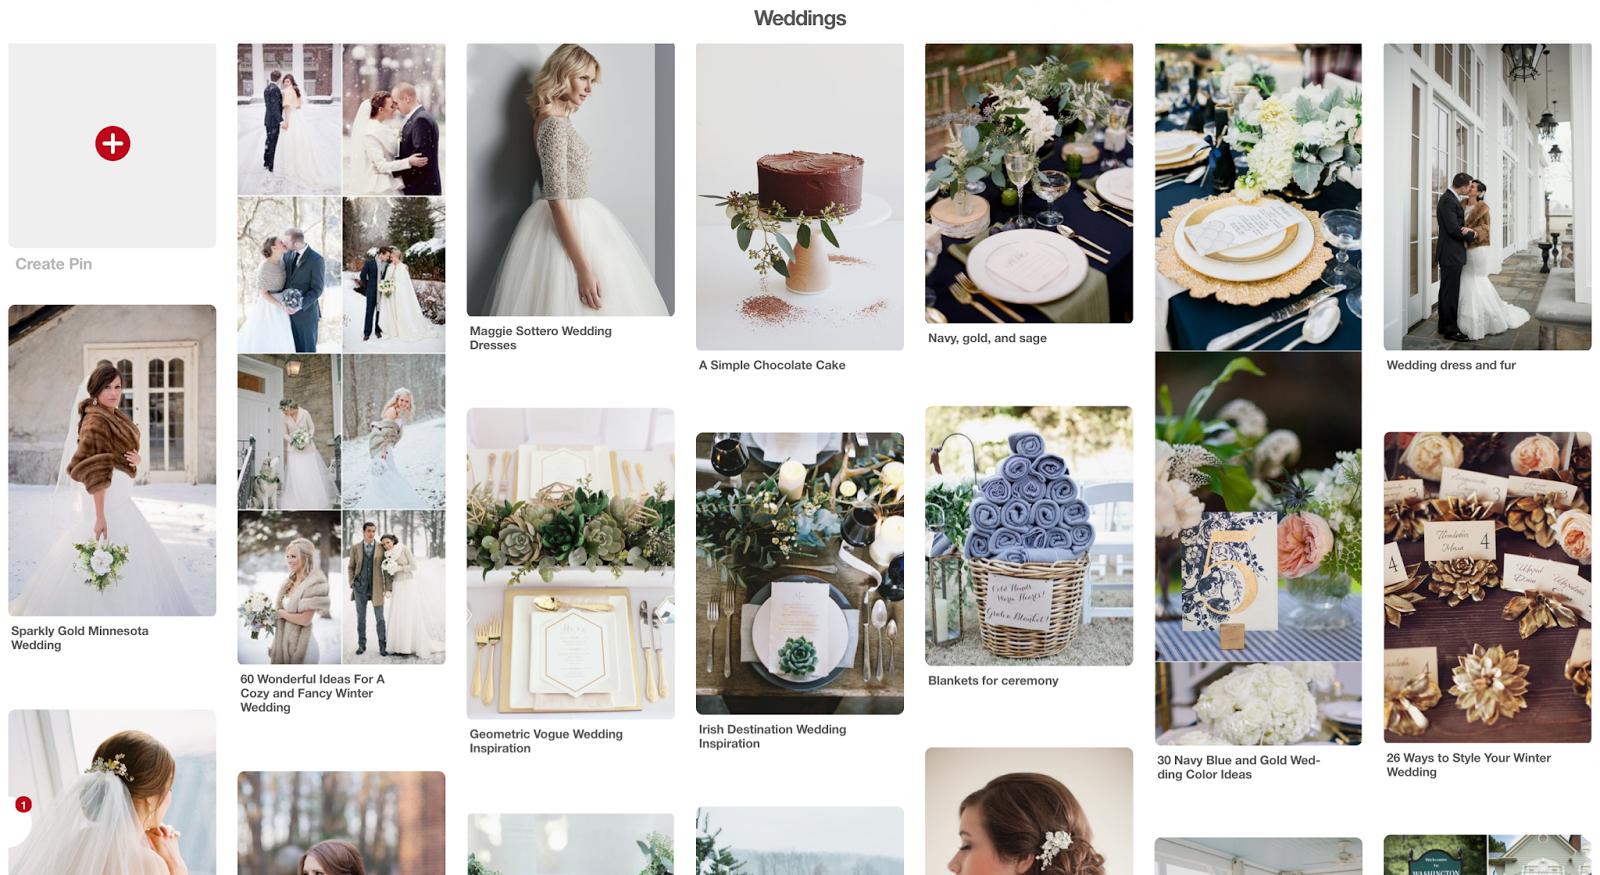 wedding inspiration - wedding pinterest board - winter wedding inspiration